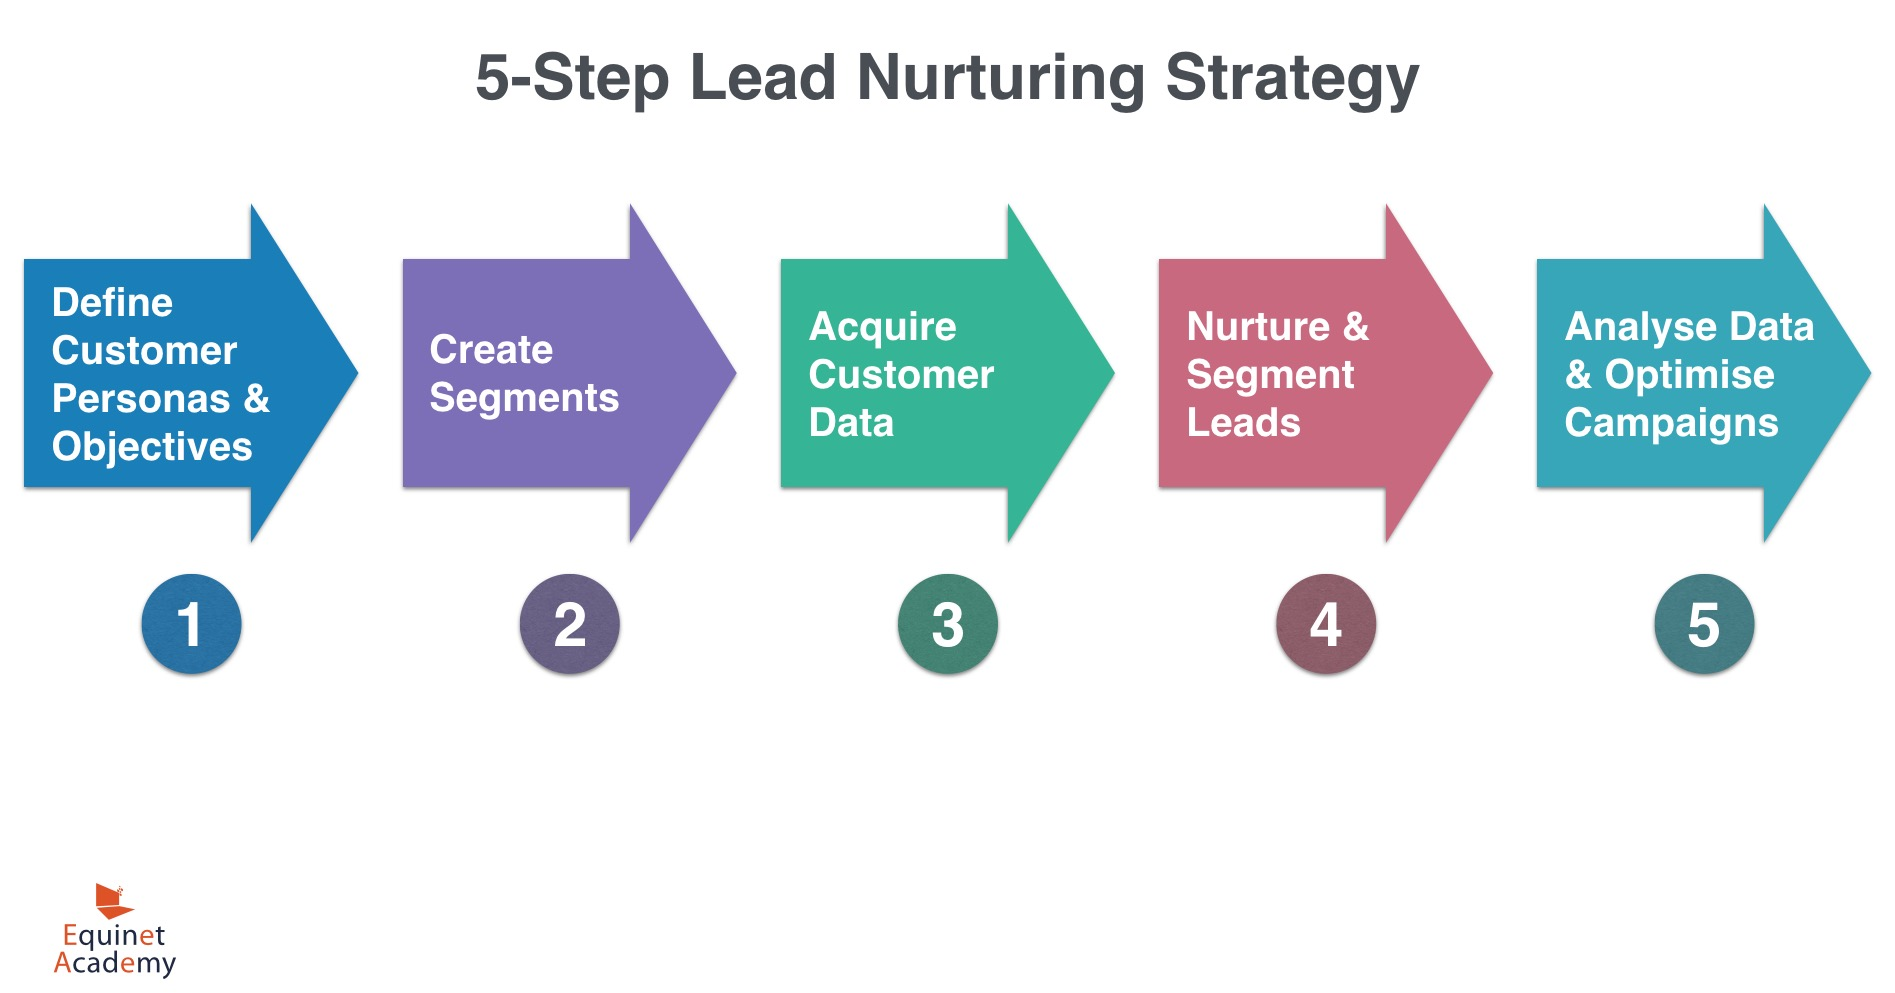 5-Step Lead Nurturing Strategy